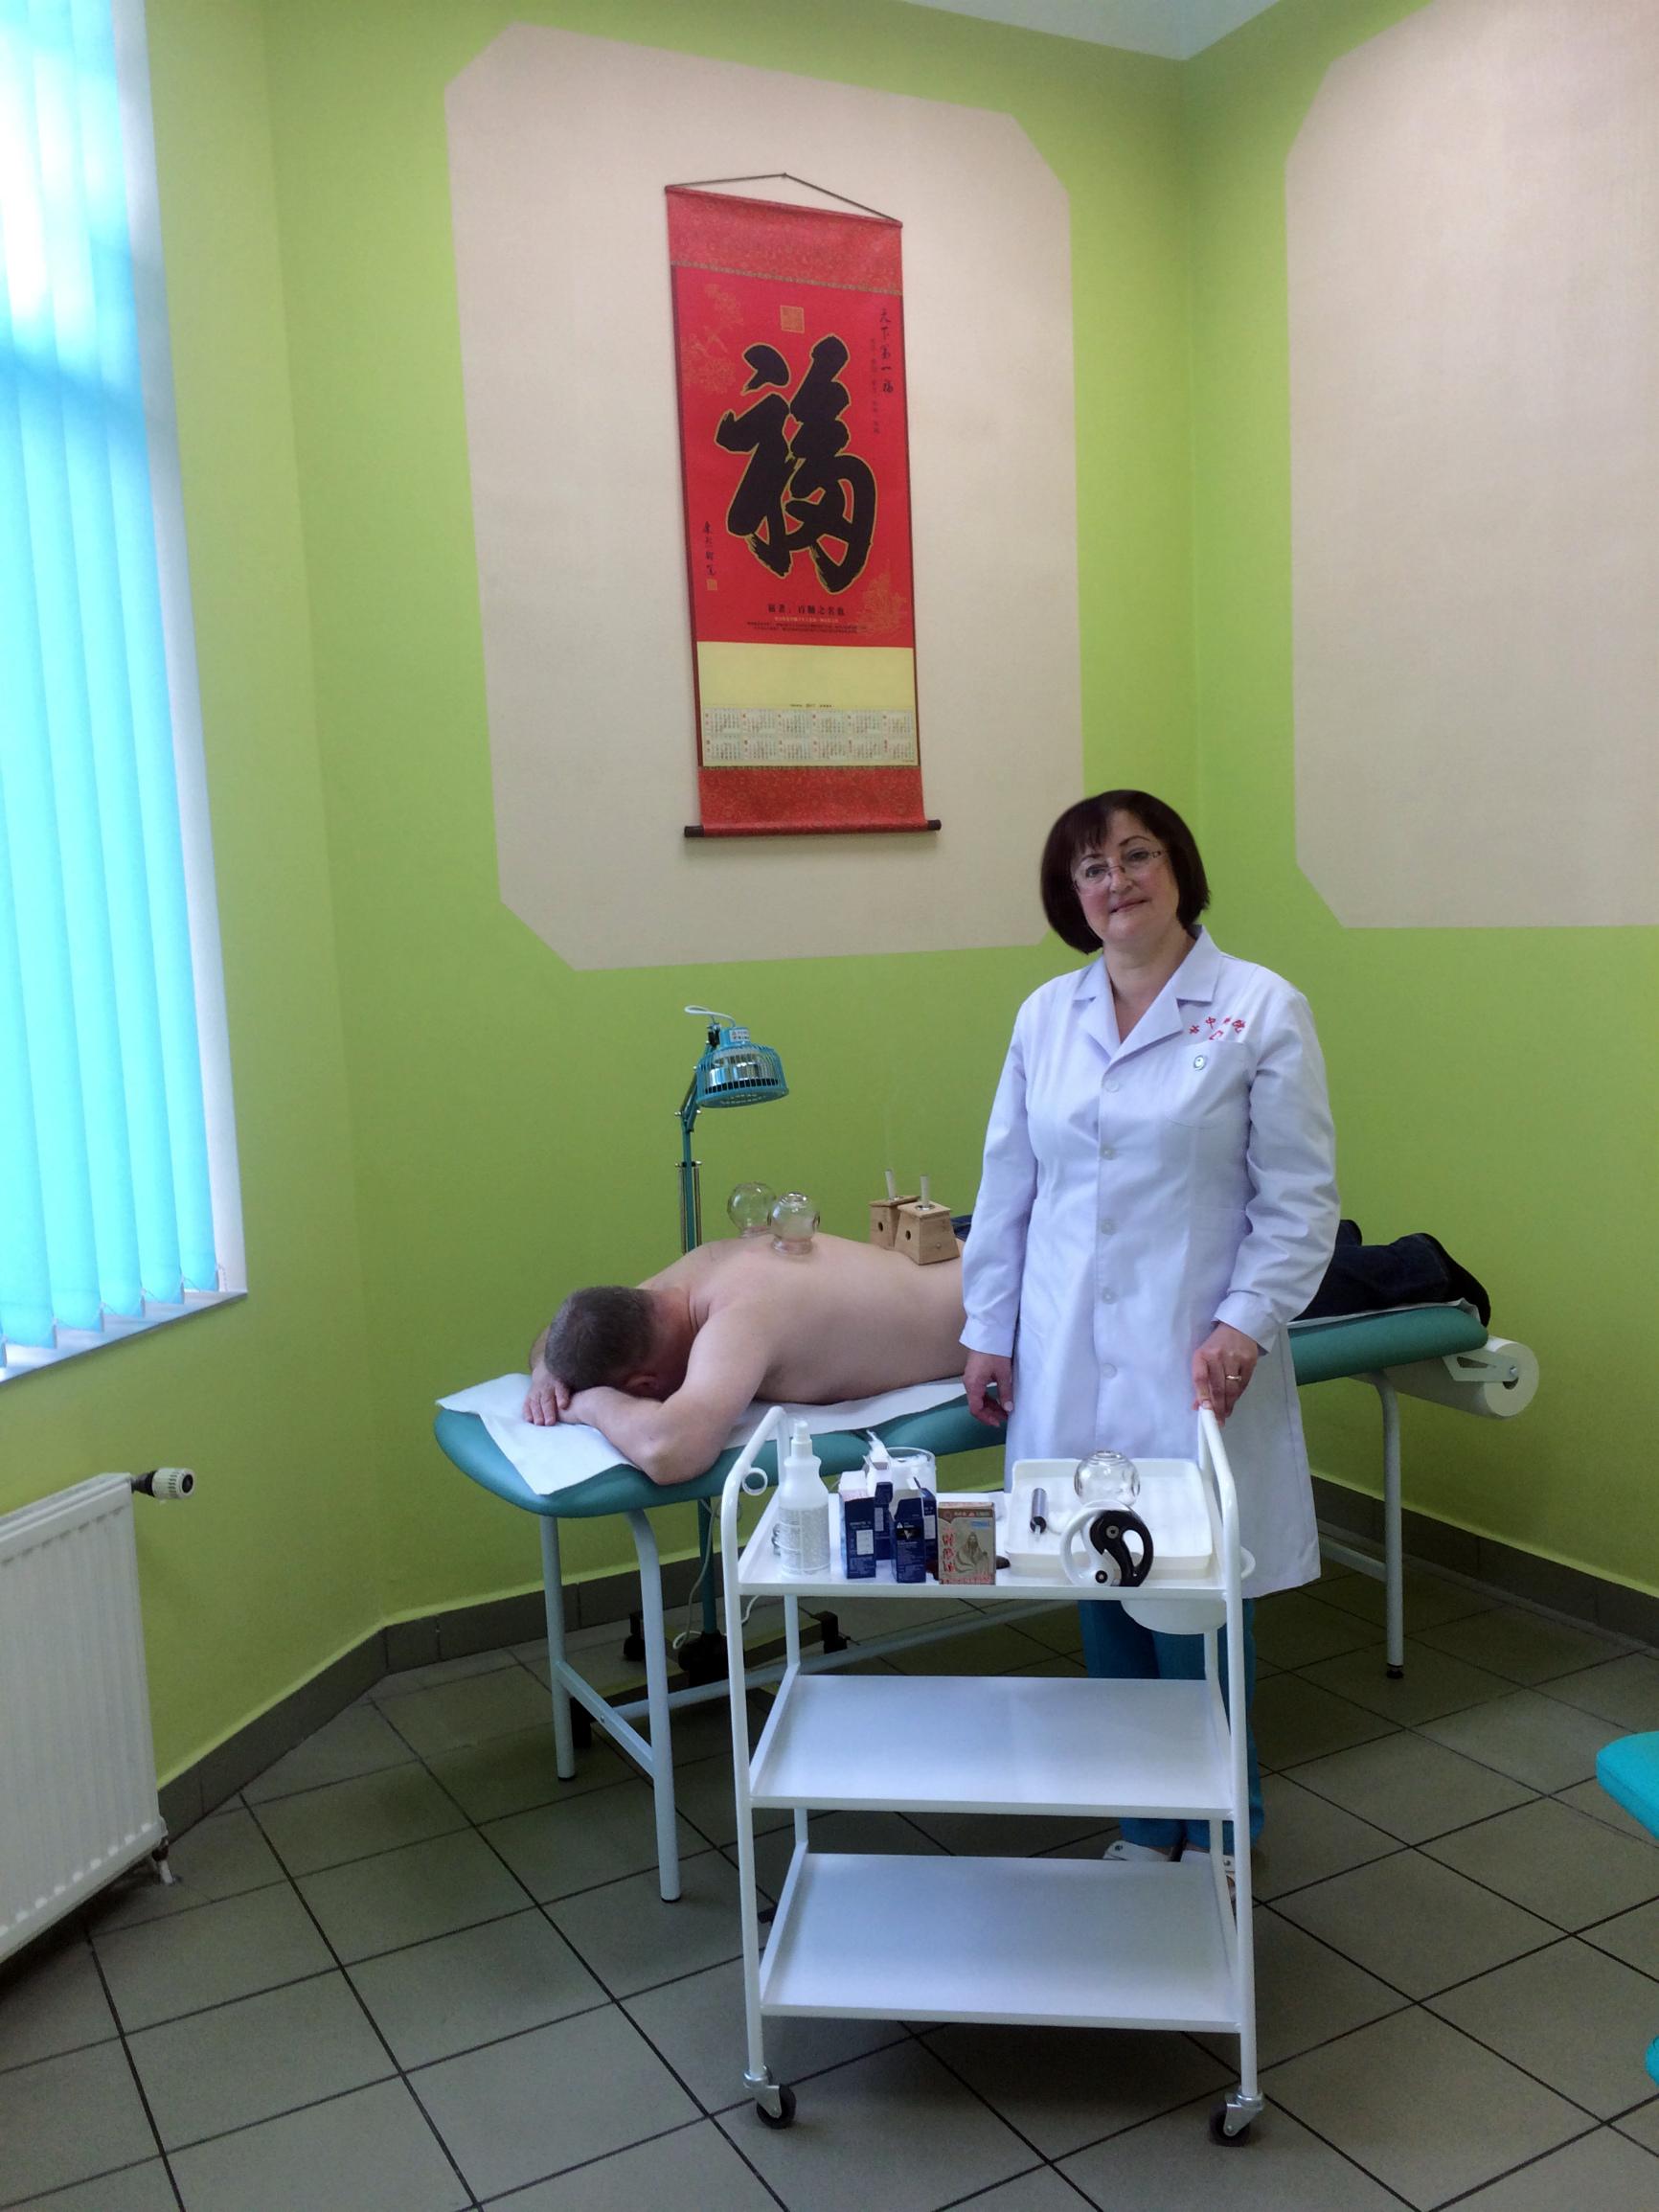 https://www.ozonoterapia.bydgoszcz.pl/wp-content/uploads/2017/06/181.jpg